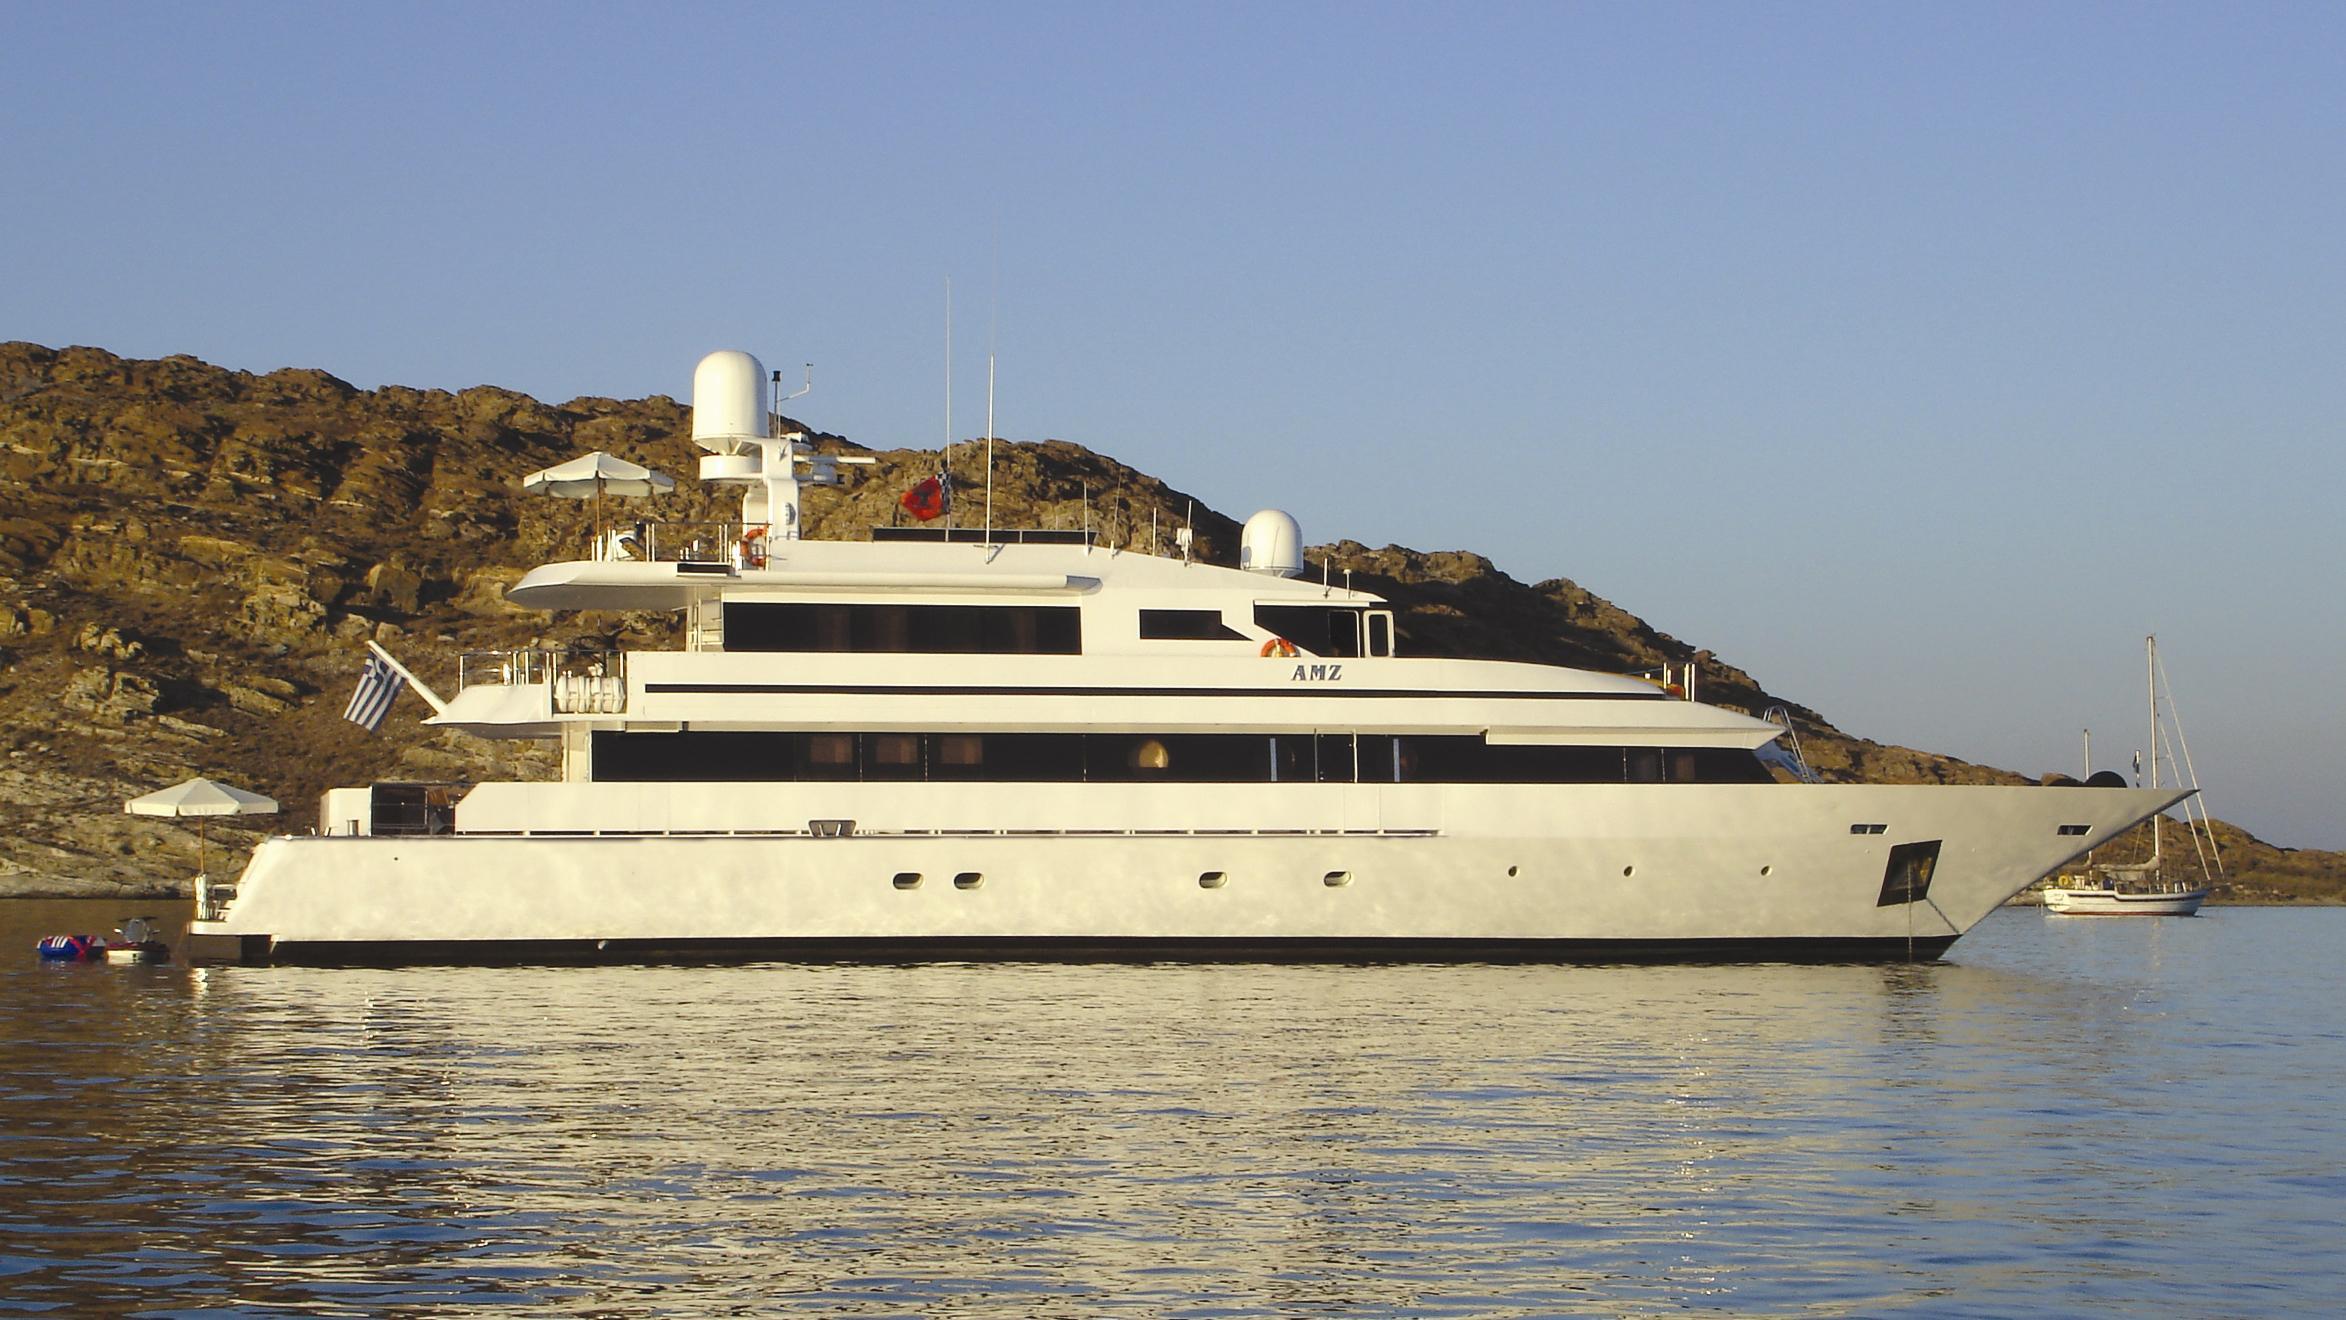 amz-yacht-for-sale-profile